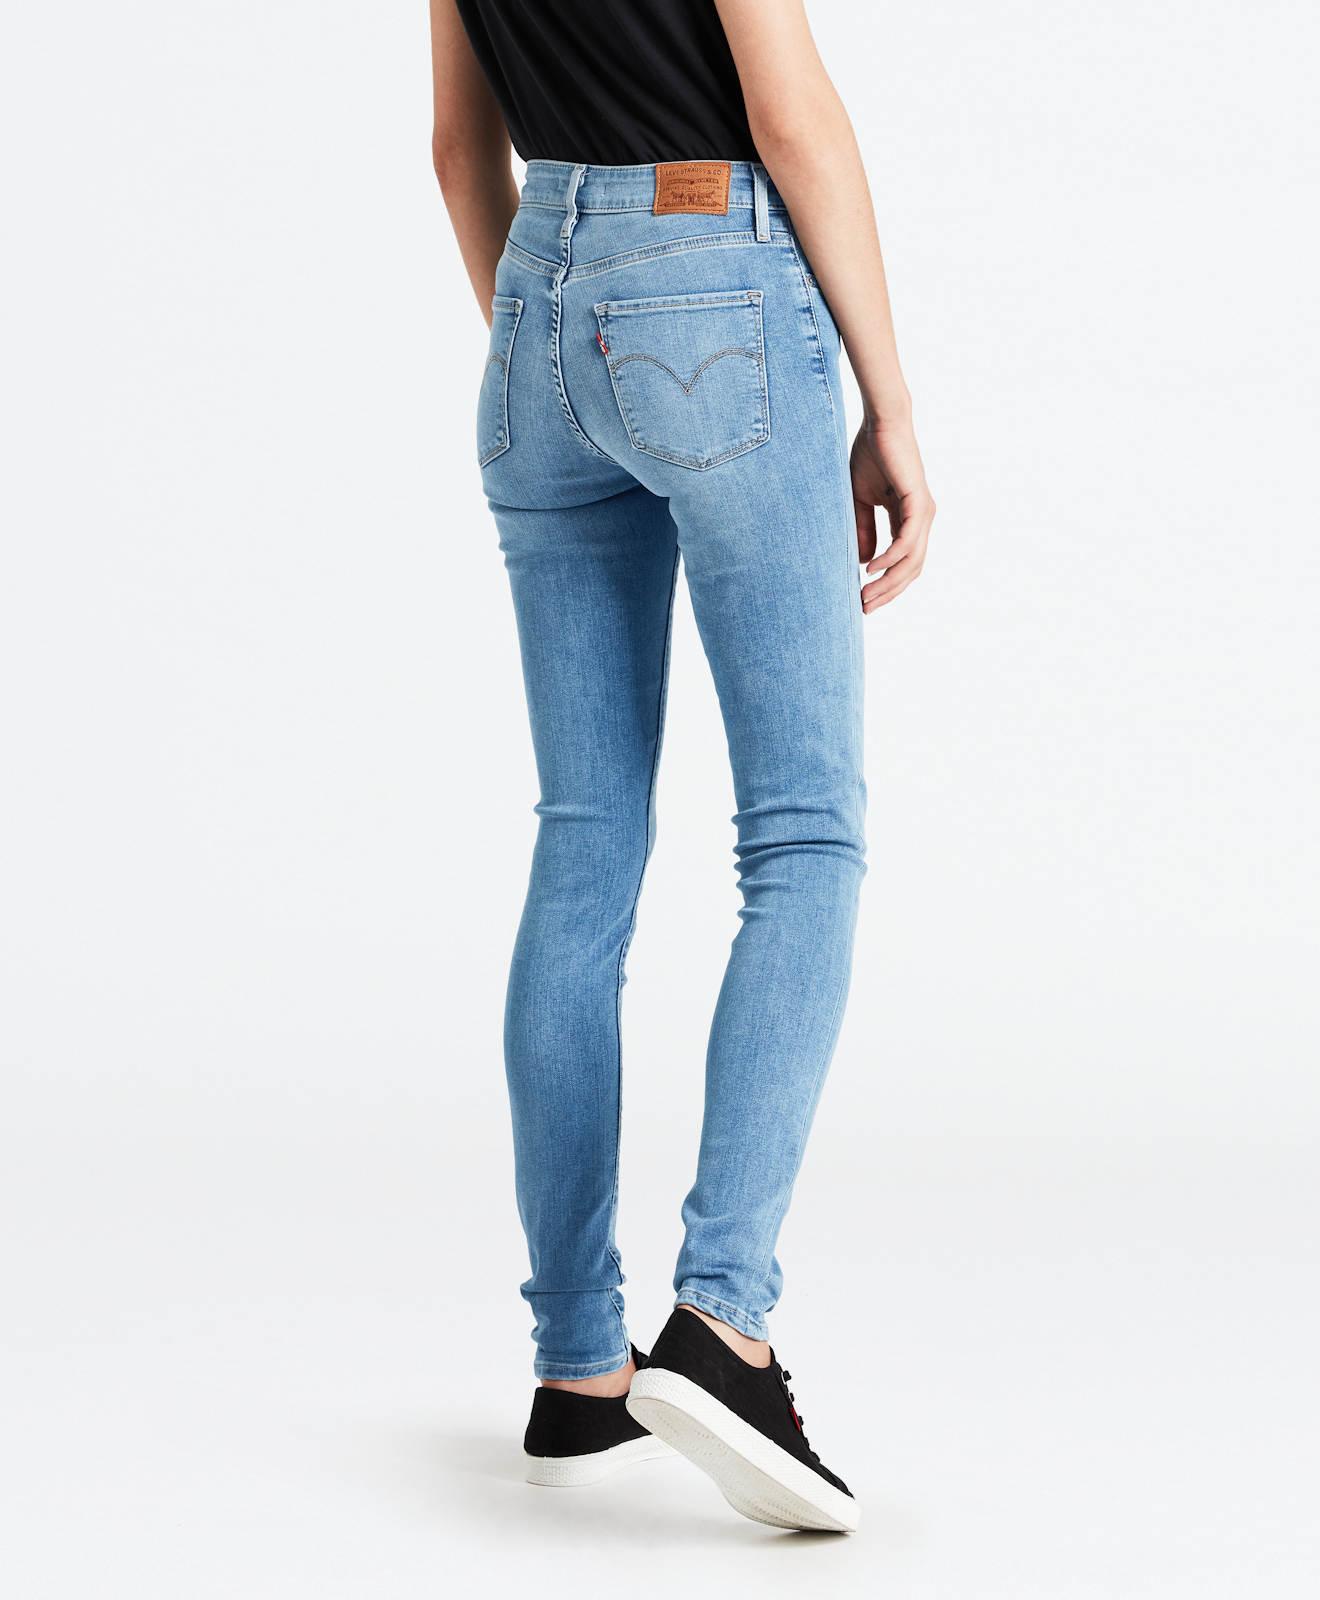 My Skinny Sunshine Levi's alta Hose vita Damen ® Jeans Original Steal a Neu 721 pPgZPv